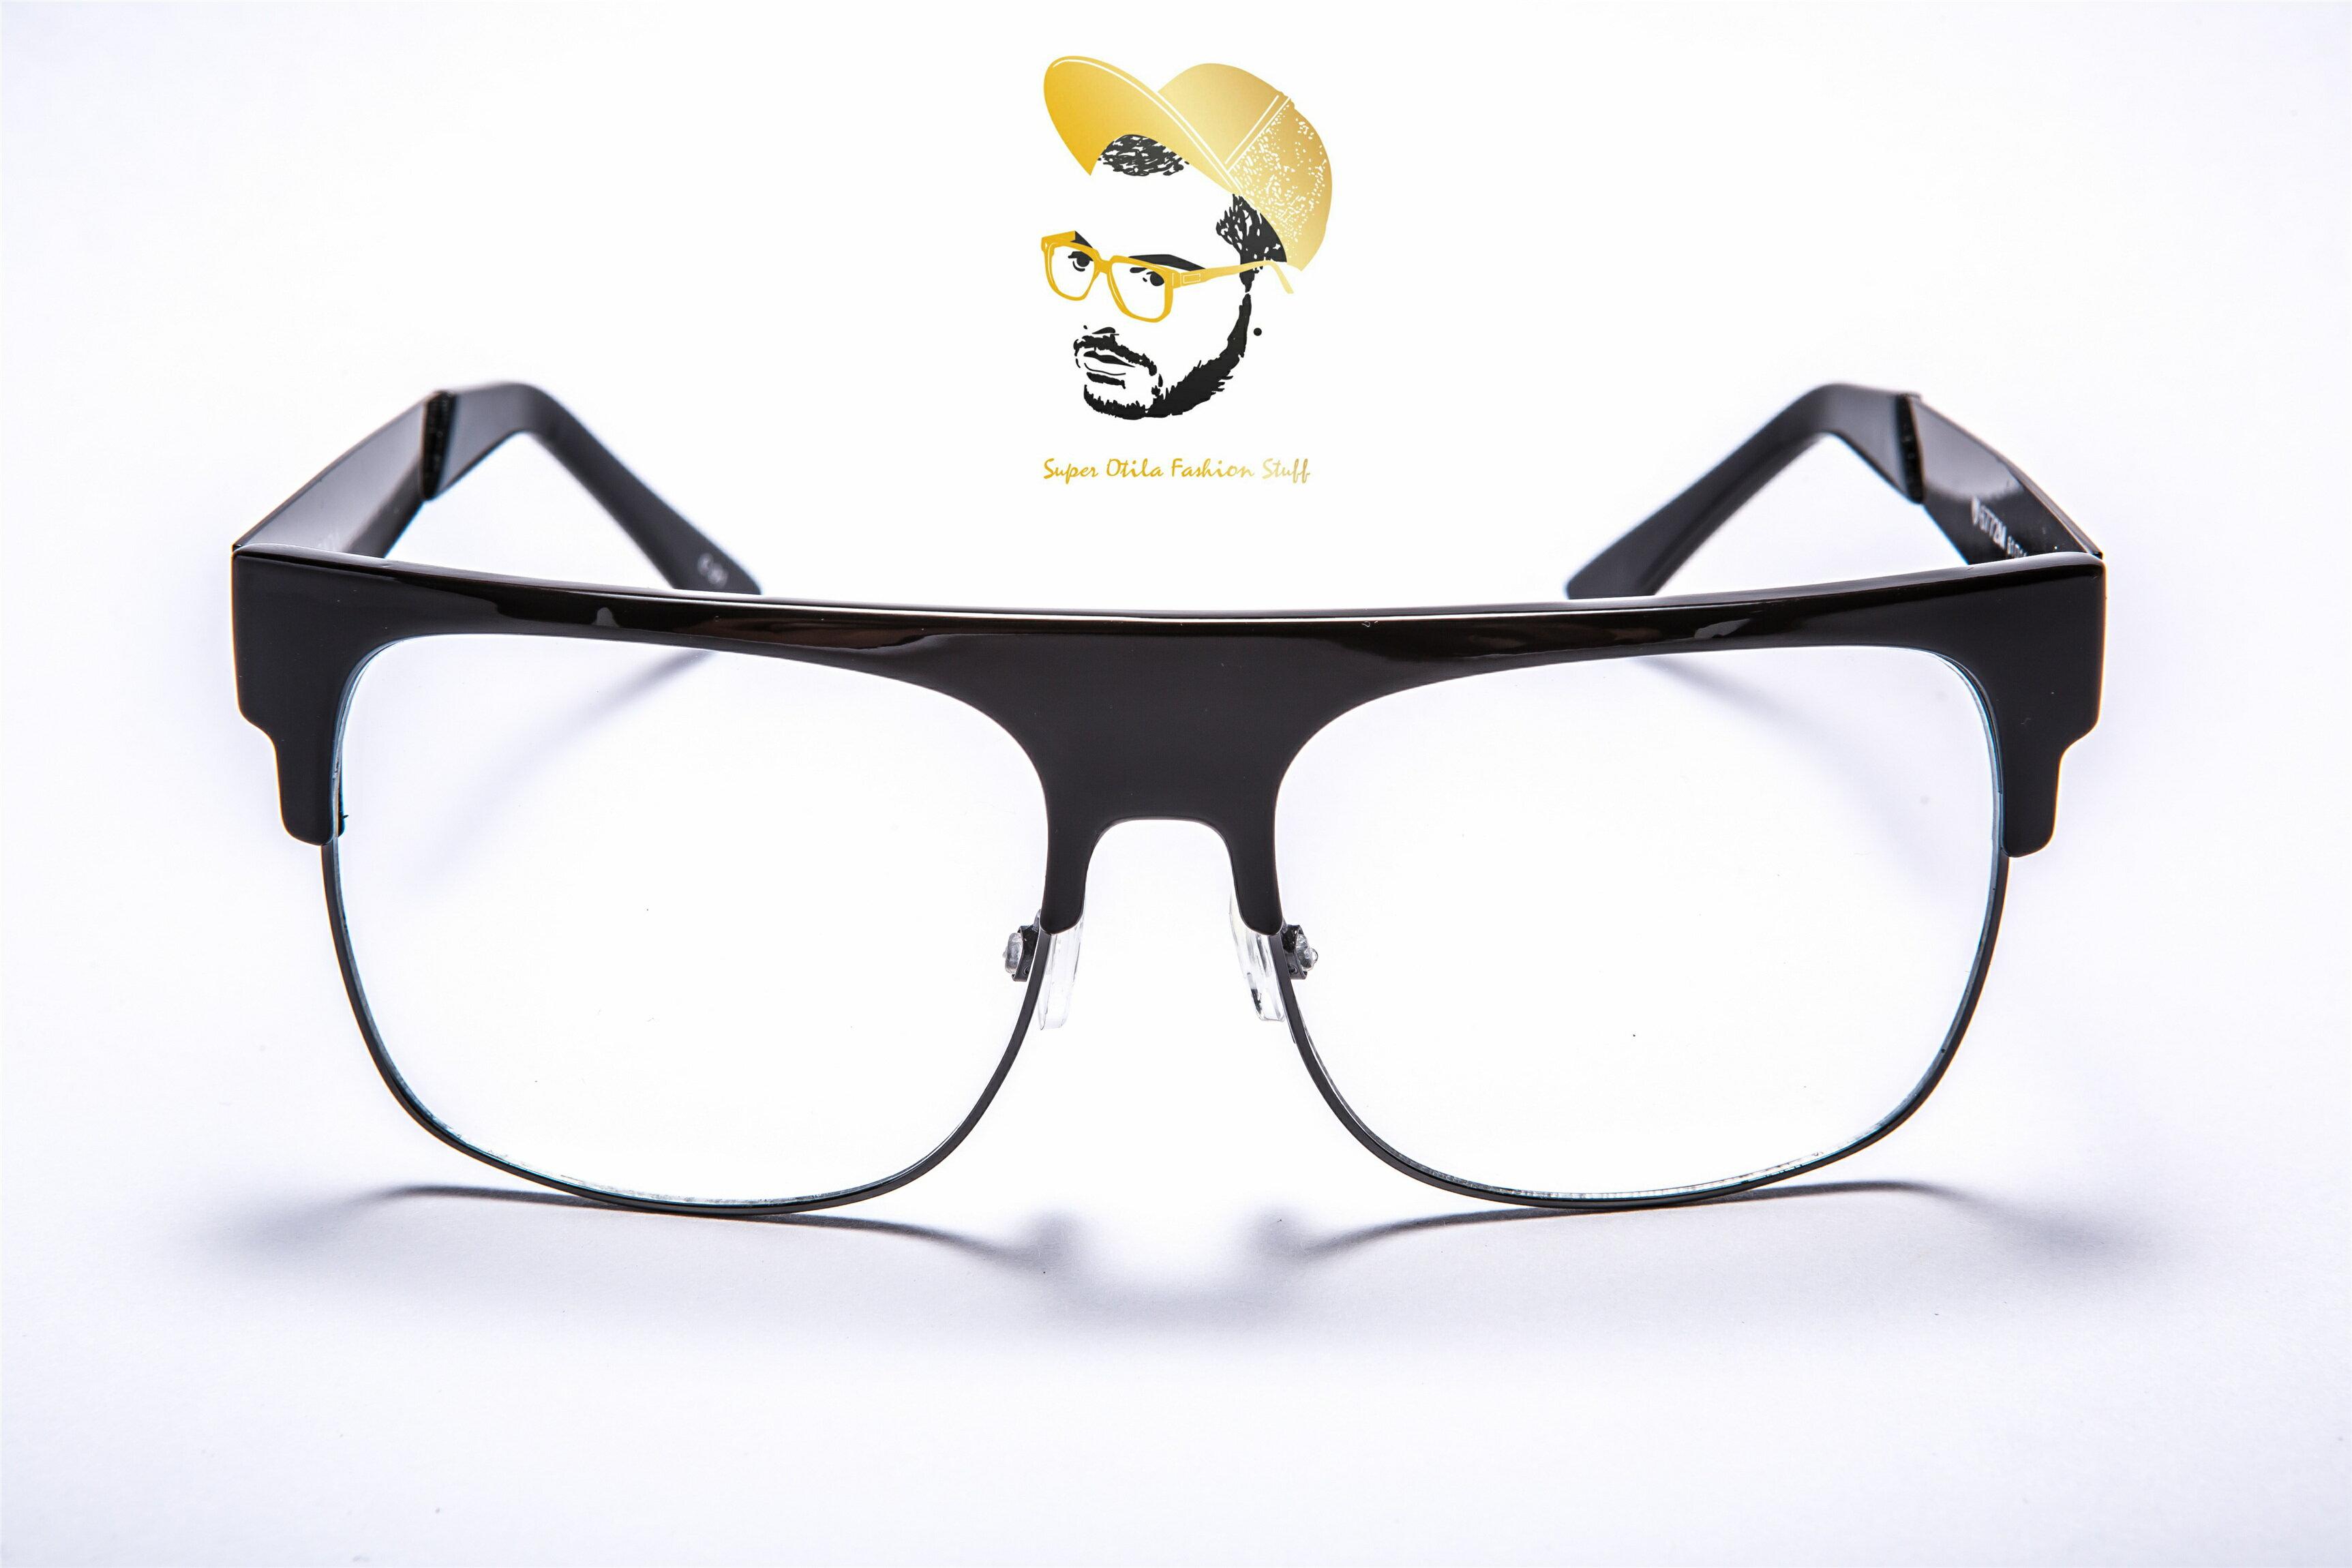 glasses for lovers 太陽眼鏡 墨鏡 眼鏡 韓國 ~6772~潮男必敗~